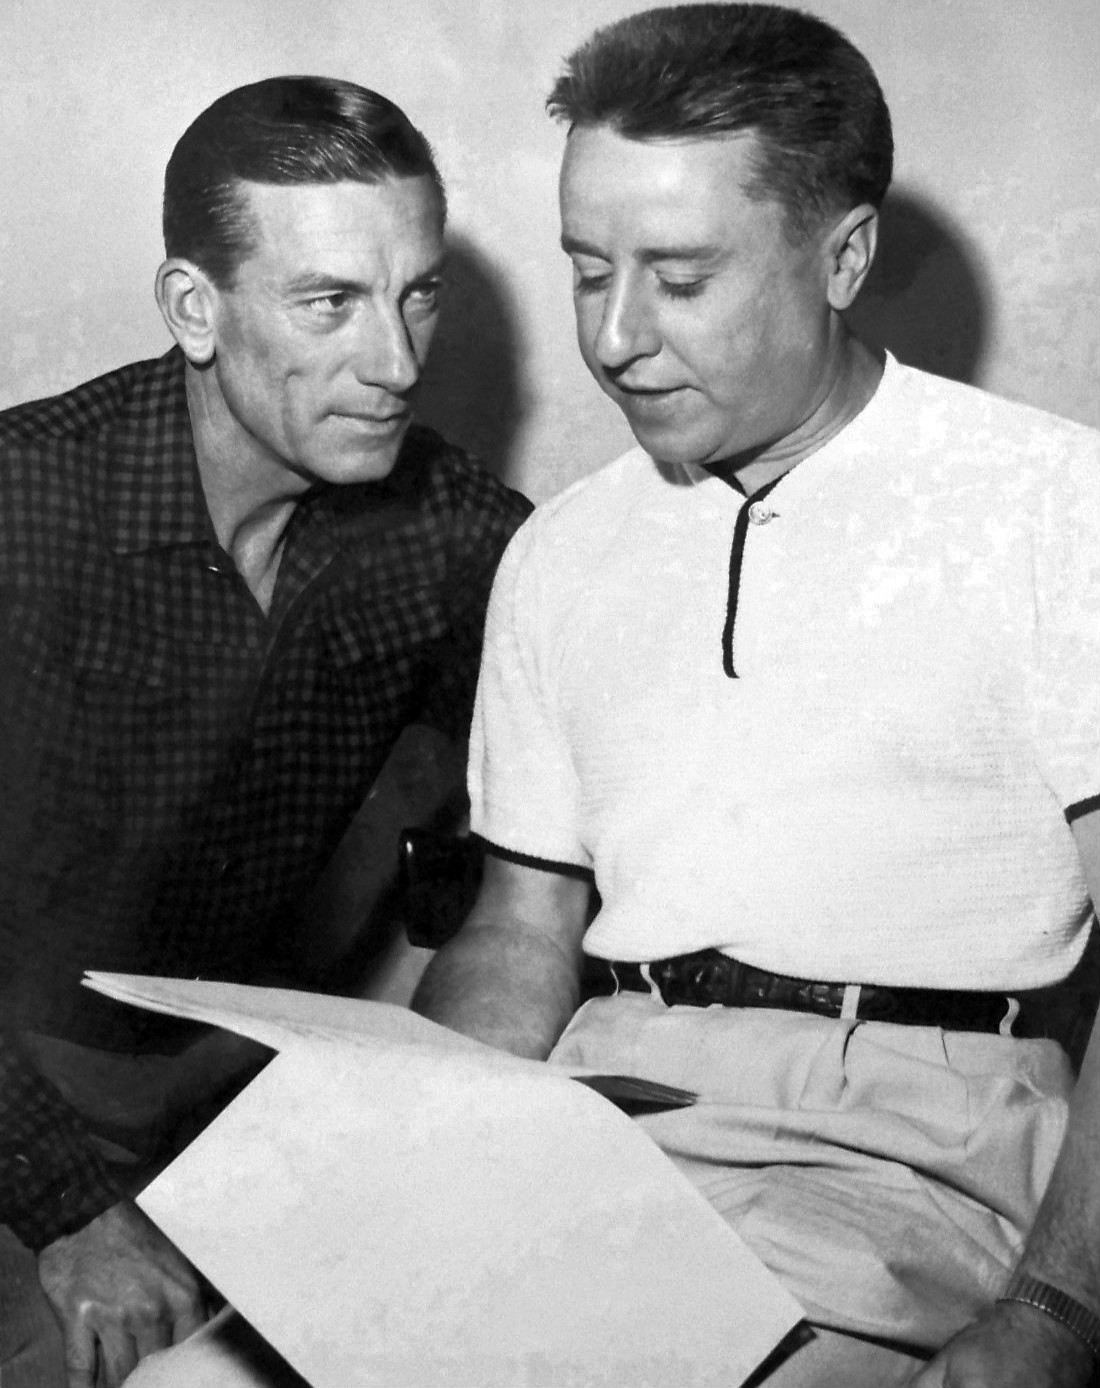 hoagy-carmichael-george-gobel-1954